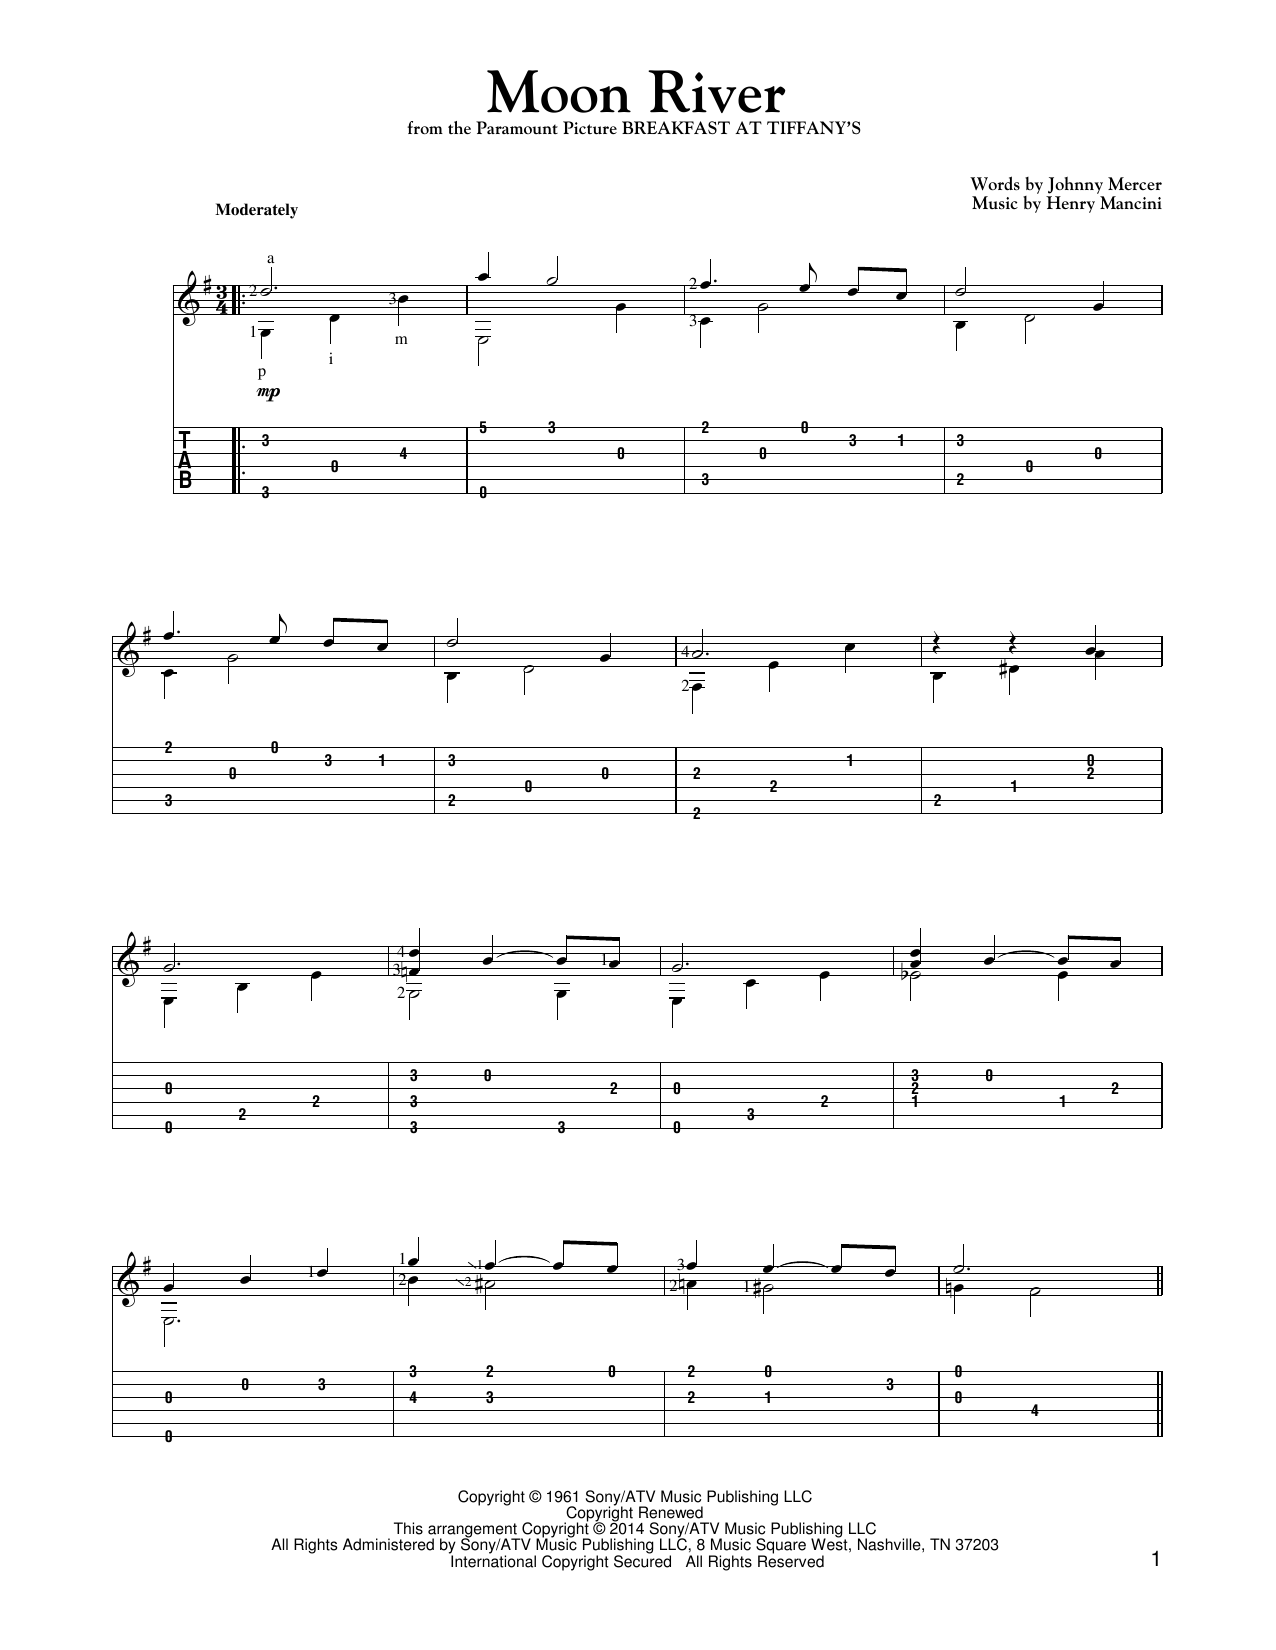 Henry Mancini 'Moon River' Sheet Music Notes, Chords | Download Printable  Guitar Tab - SKU: 154768